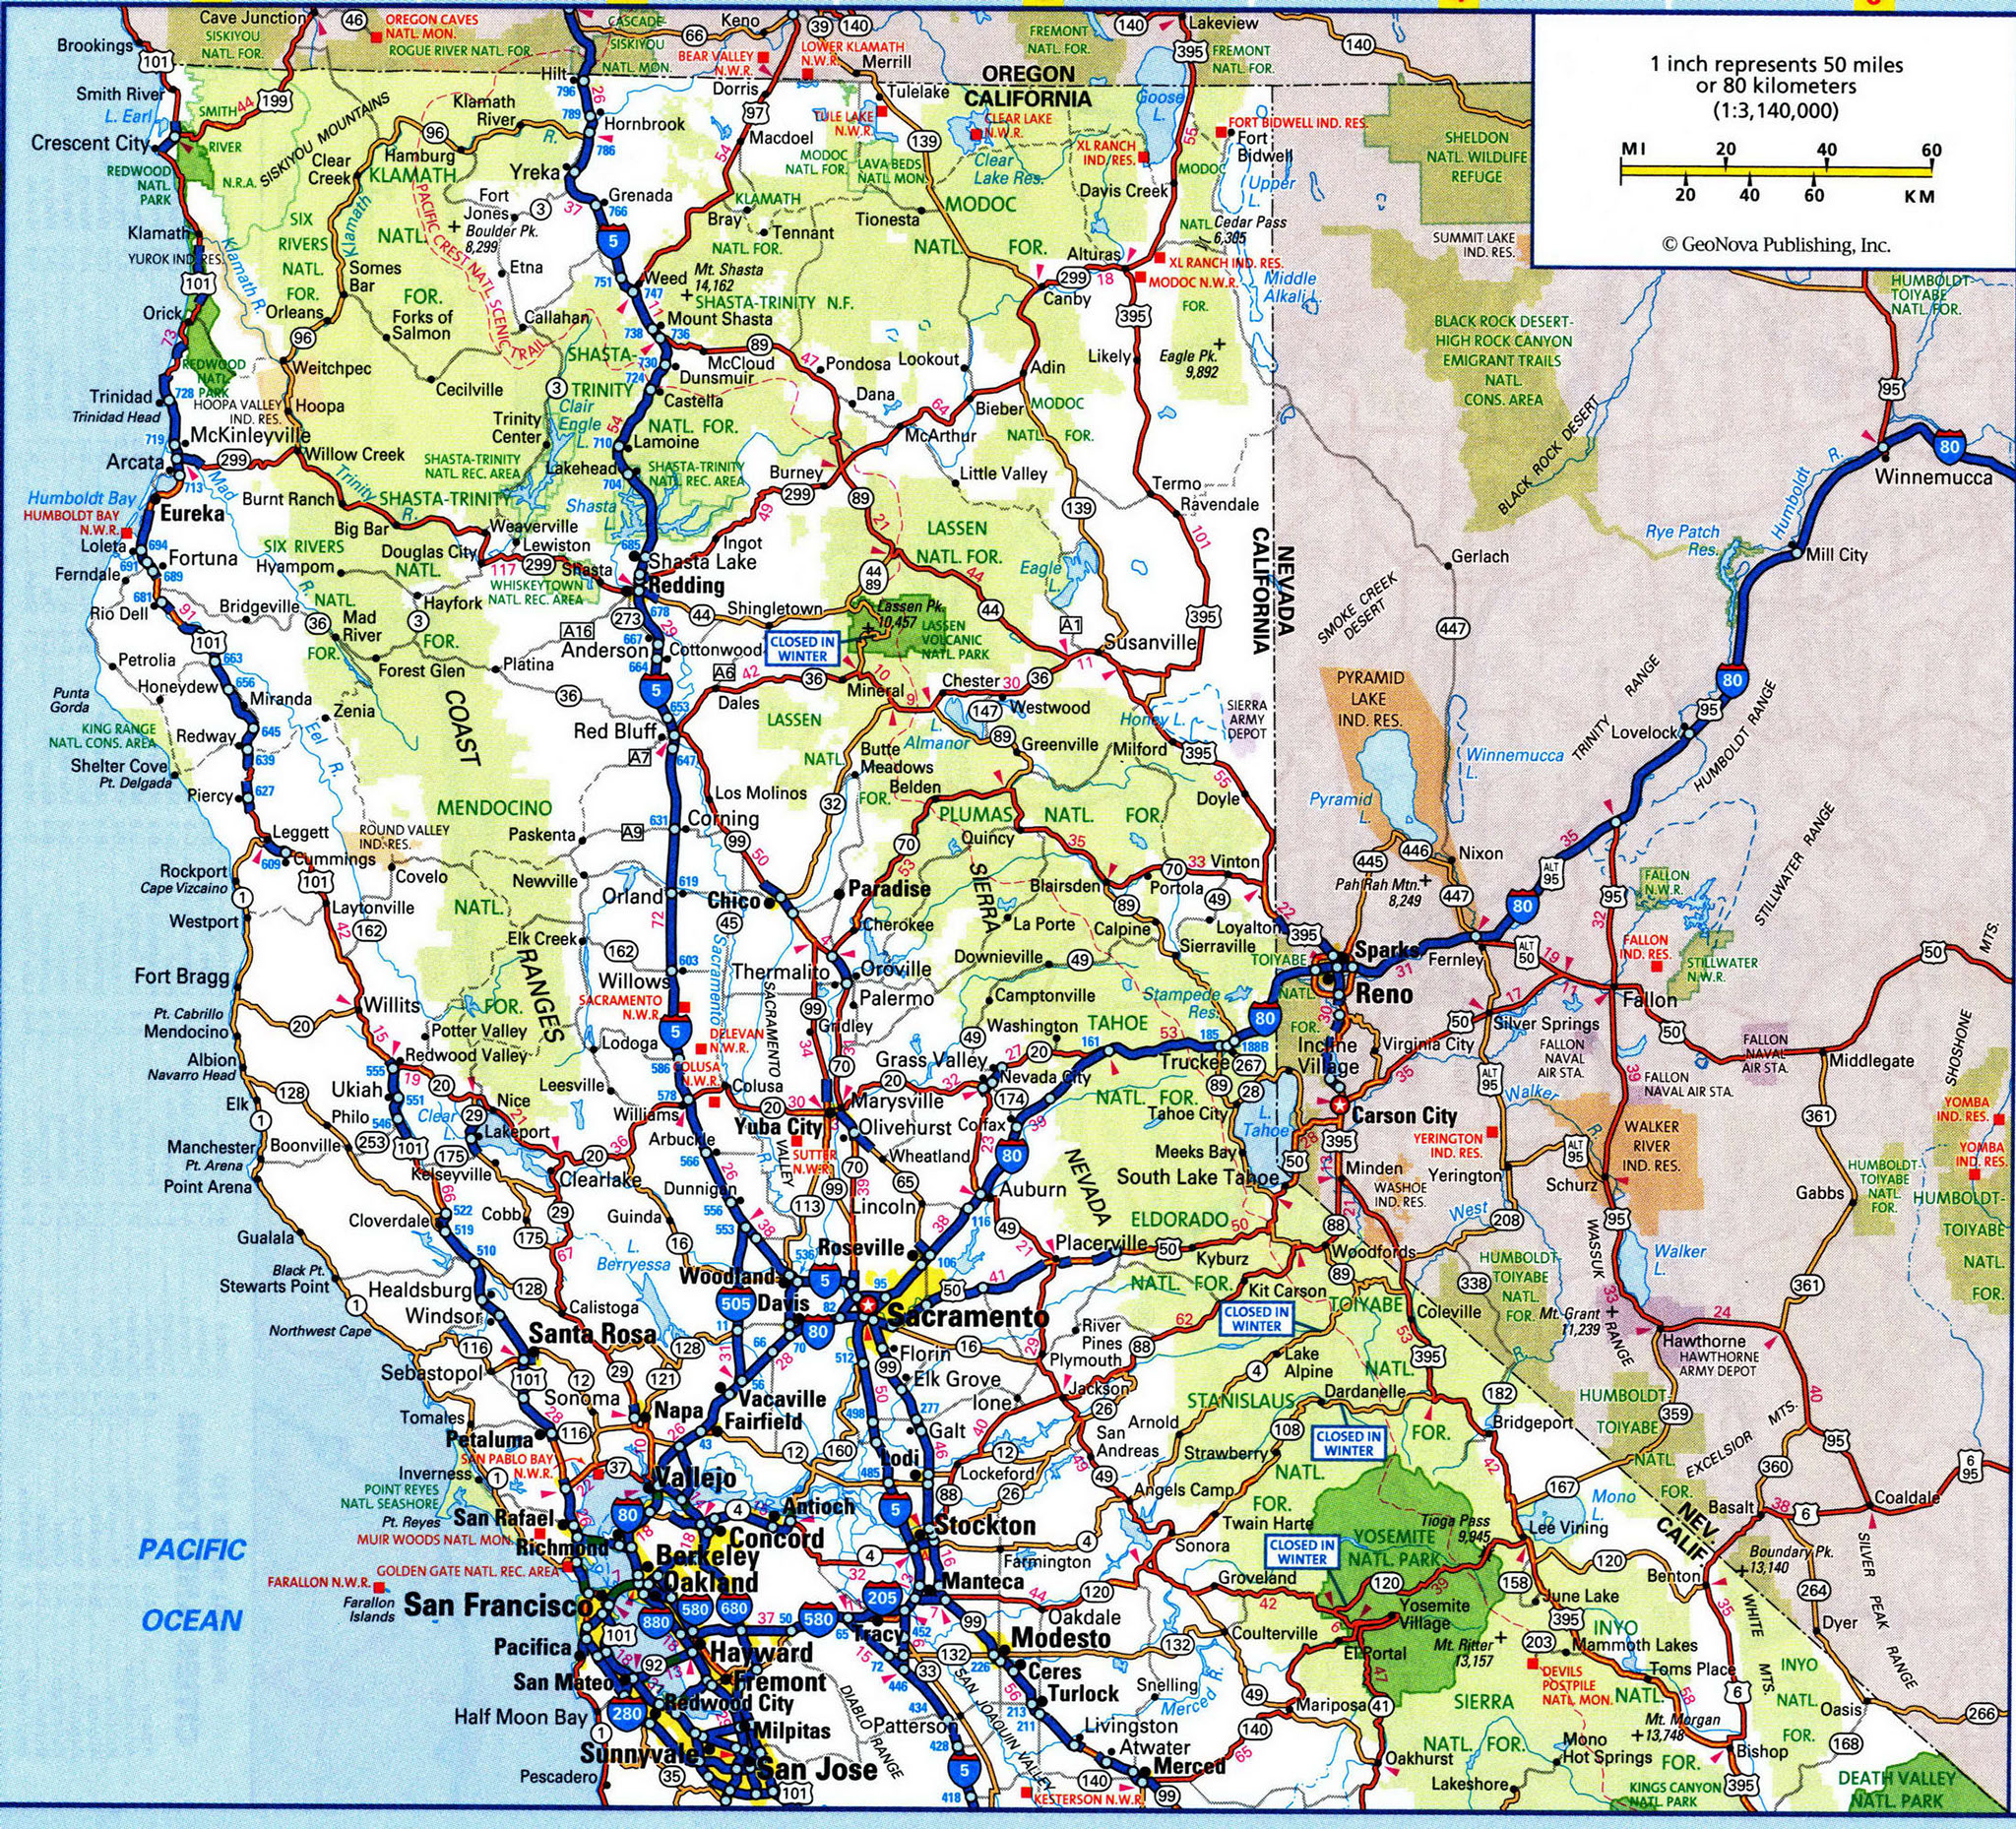 Map Of North California California River Map Detailed Map Of - Detailed Map Of Northern California